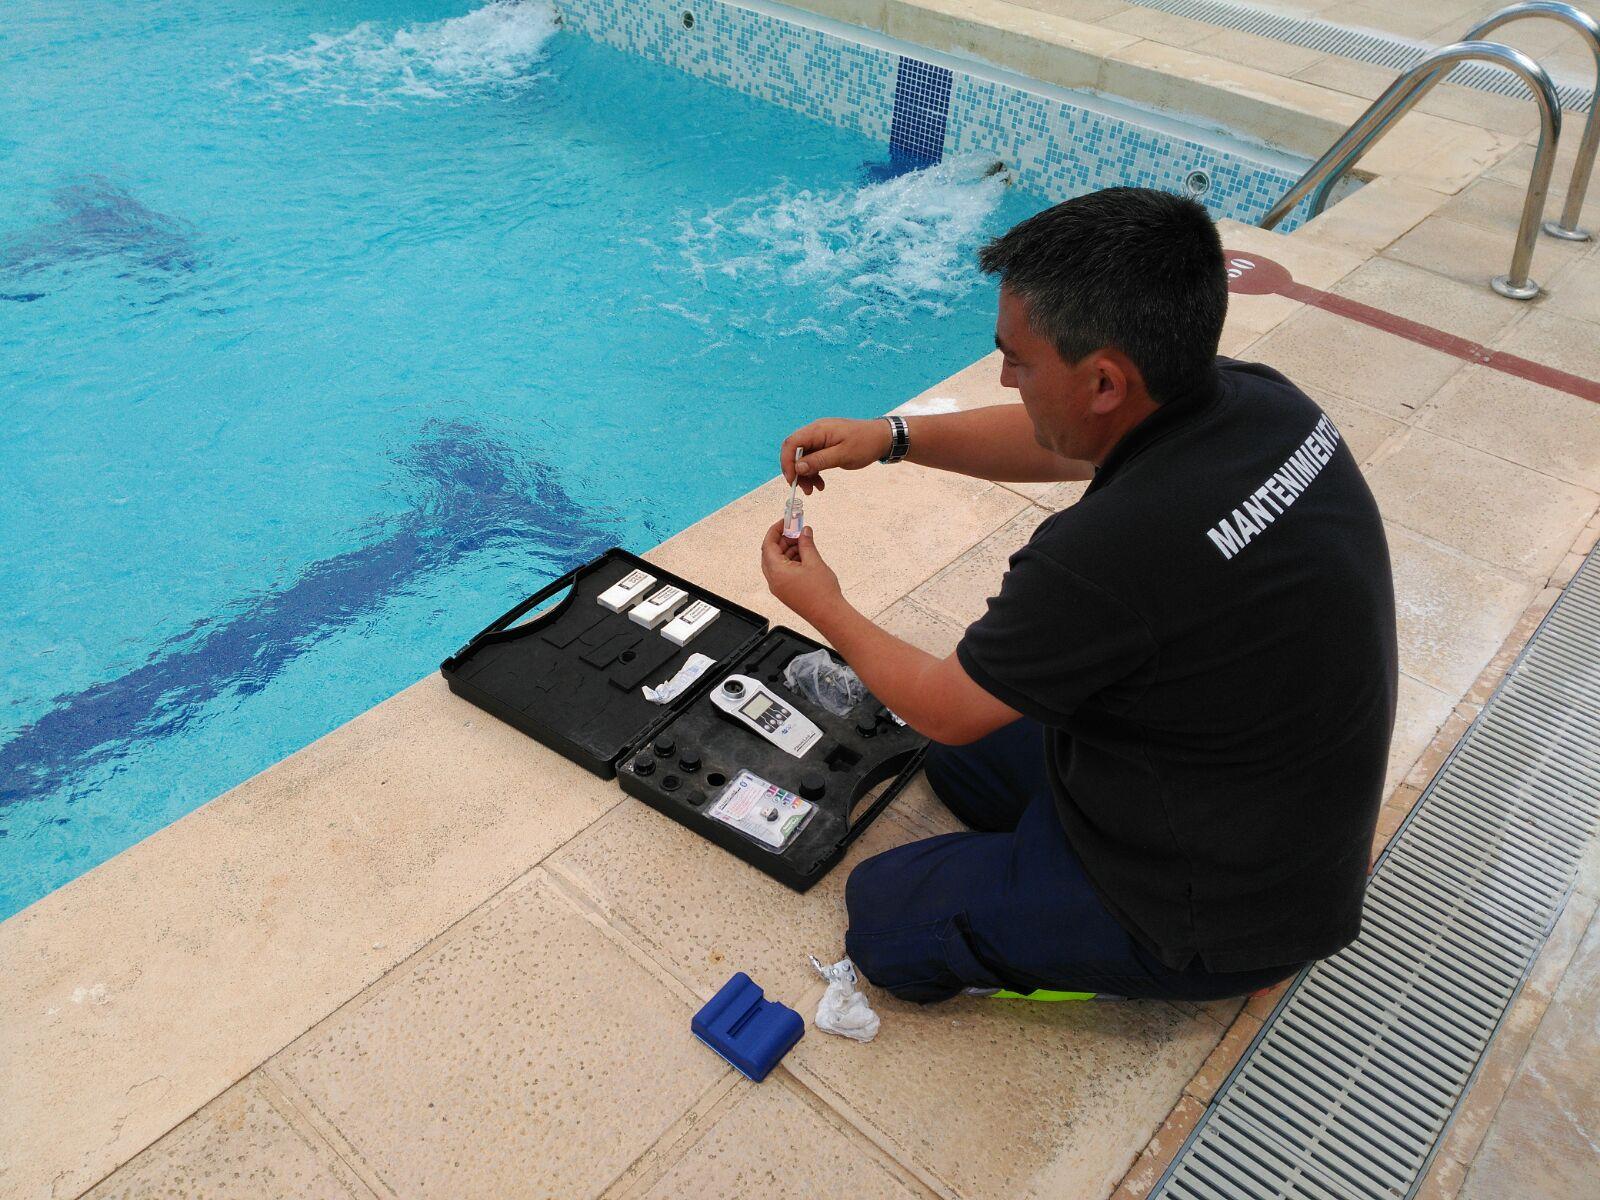 Las primeras piscinas abren en alerta naranja diario for Piscina santa teresa albacete